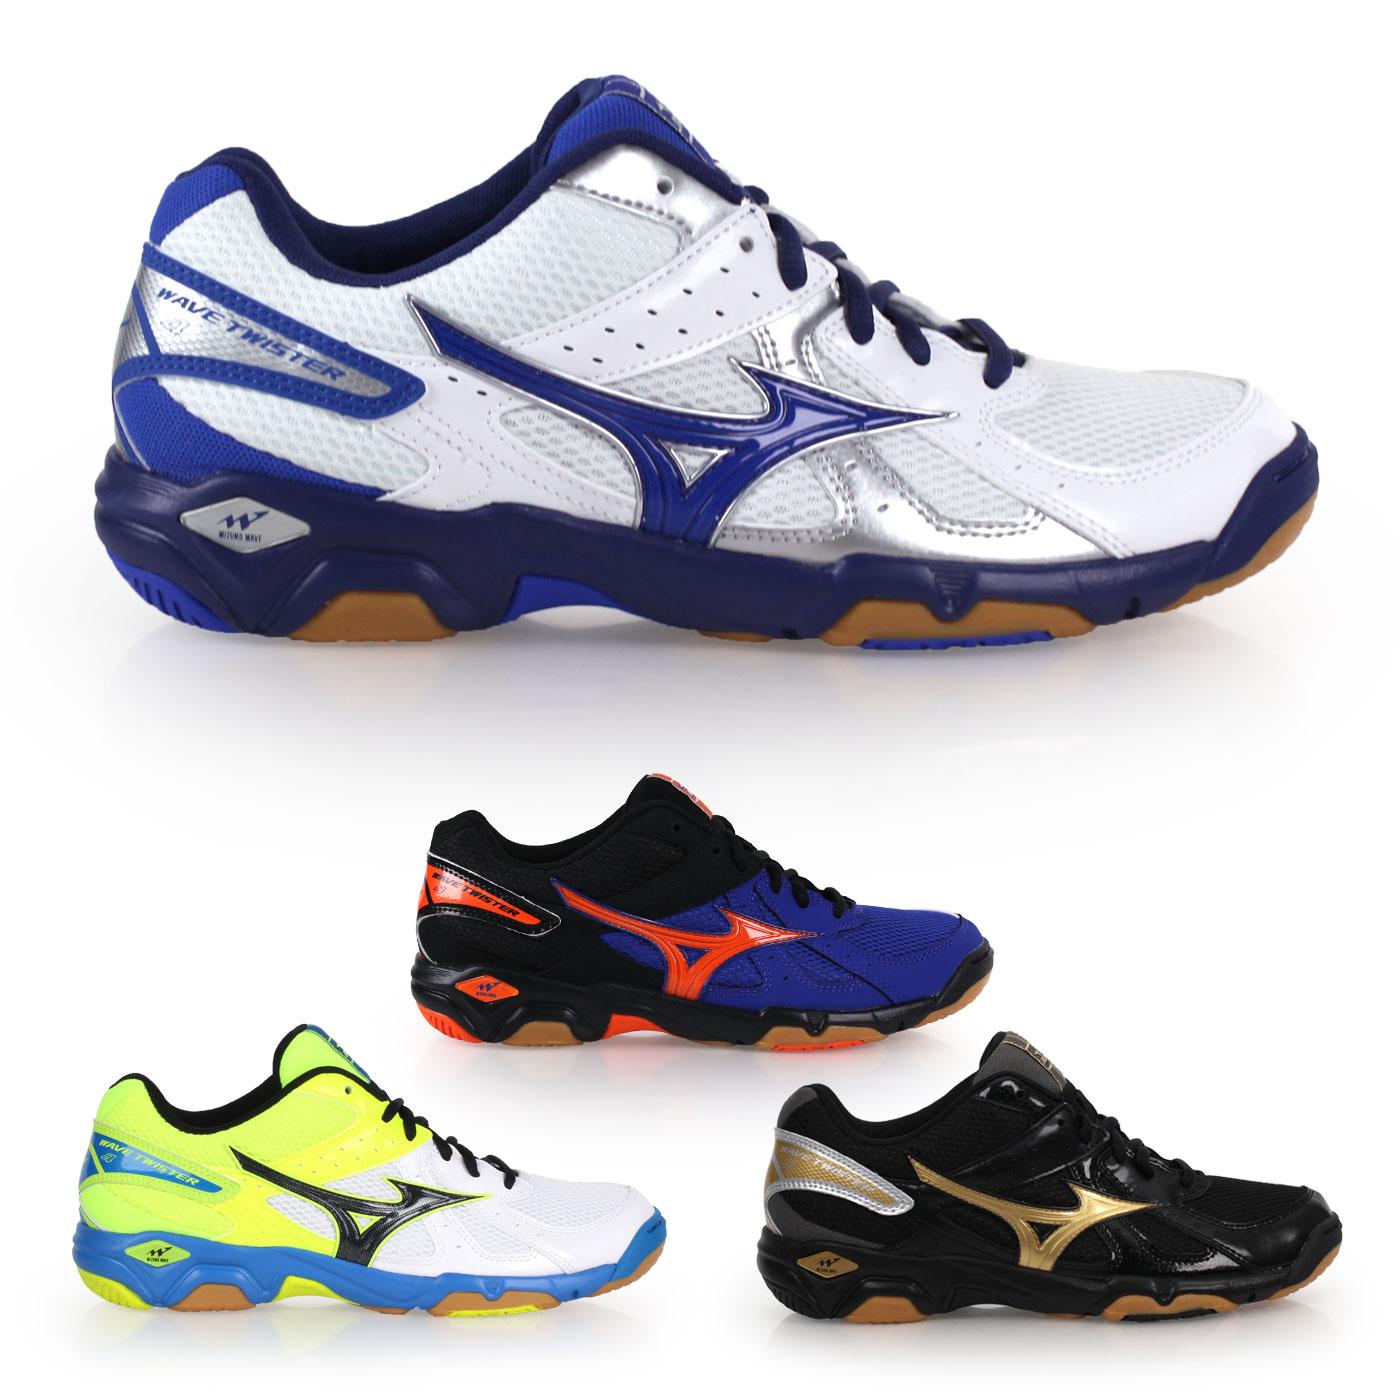 5a4dba894353 Mizuno wave twister 4 men and women volleyball shoes (free transport ã  mizuno badminton shoes 0201536